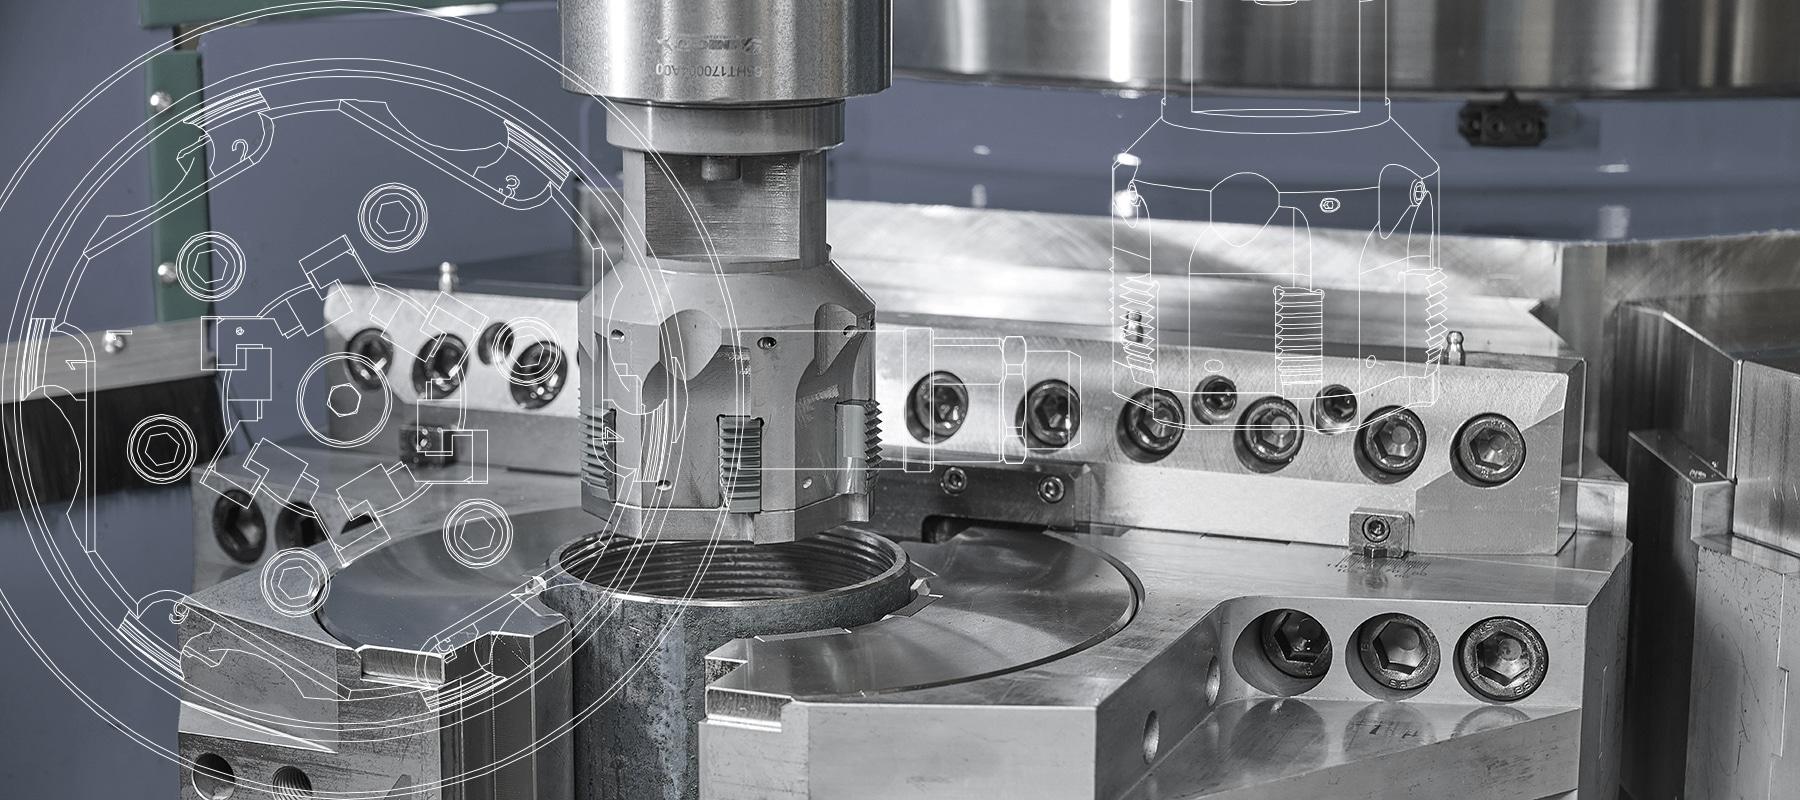 macchine sinico manufacturing